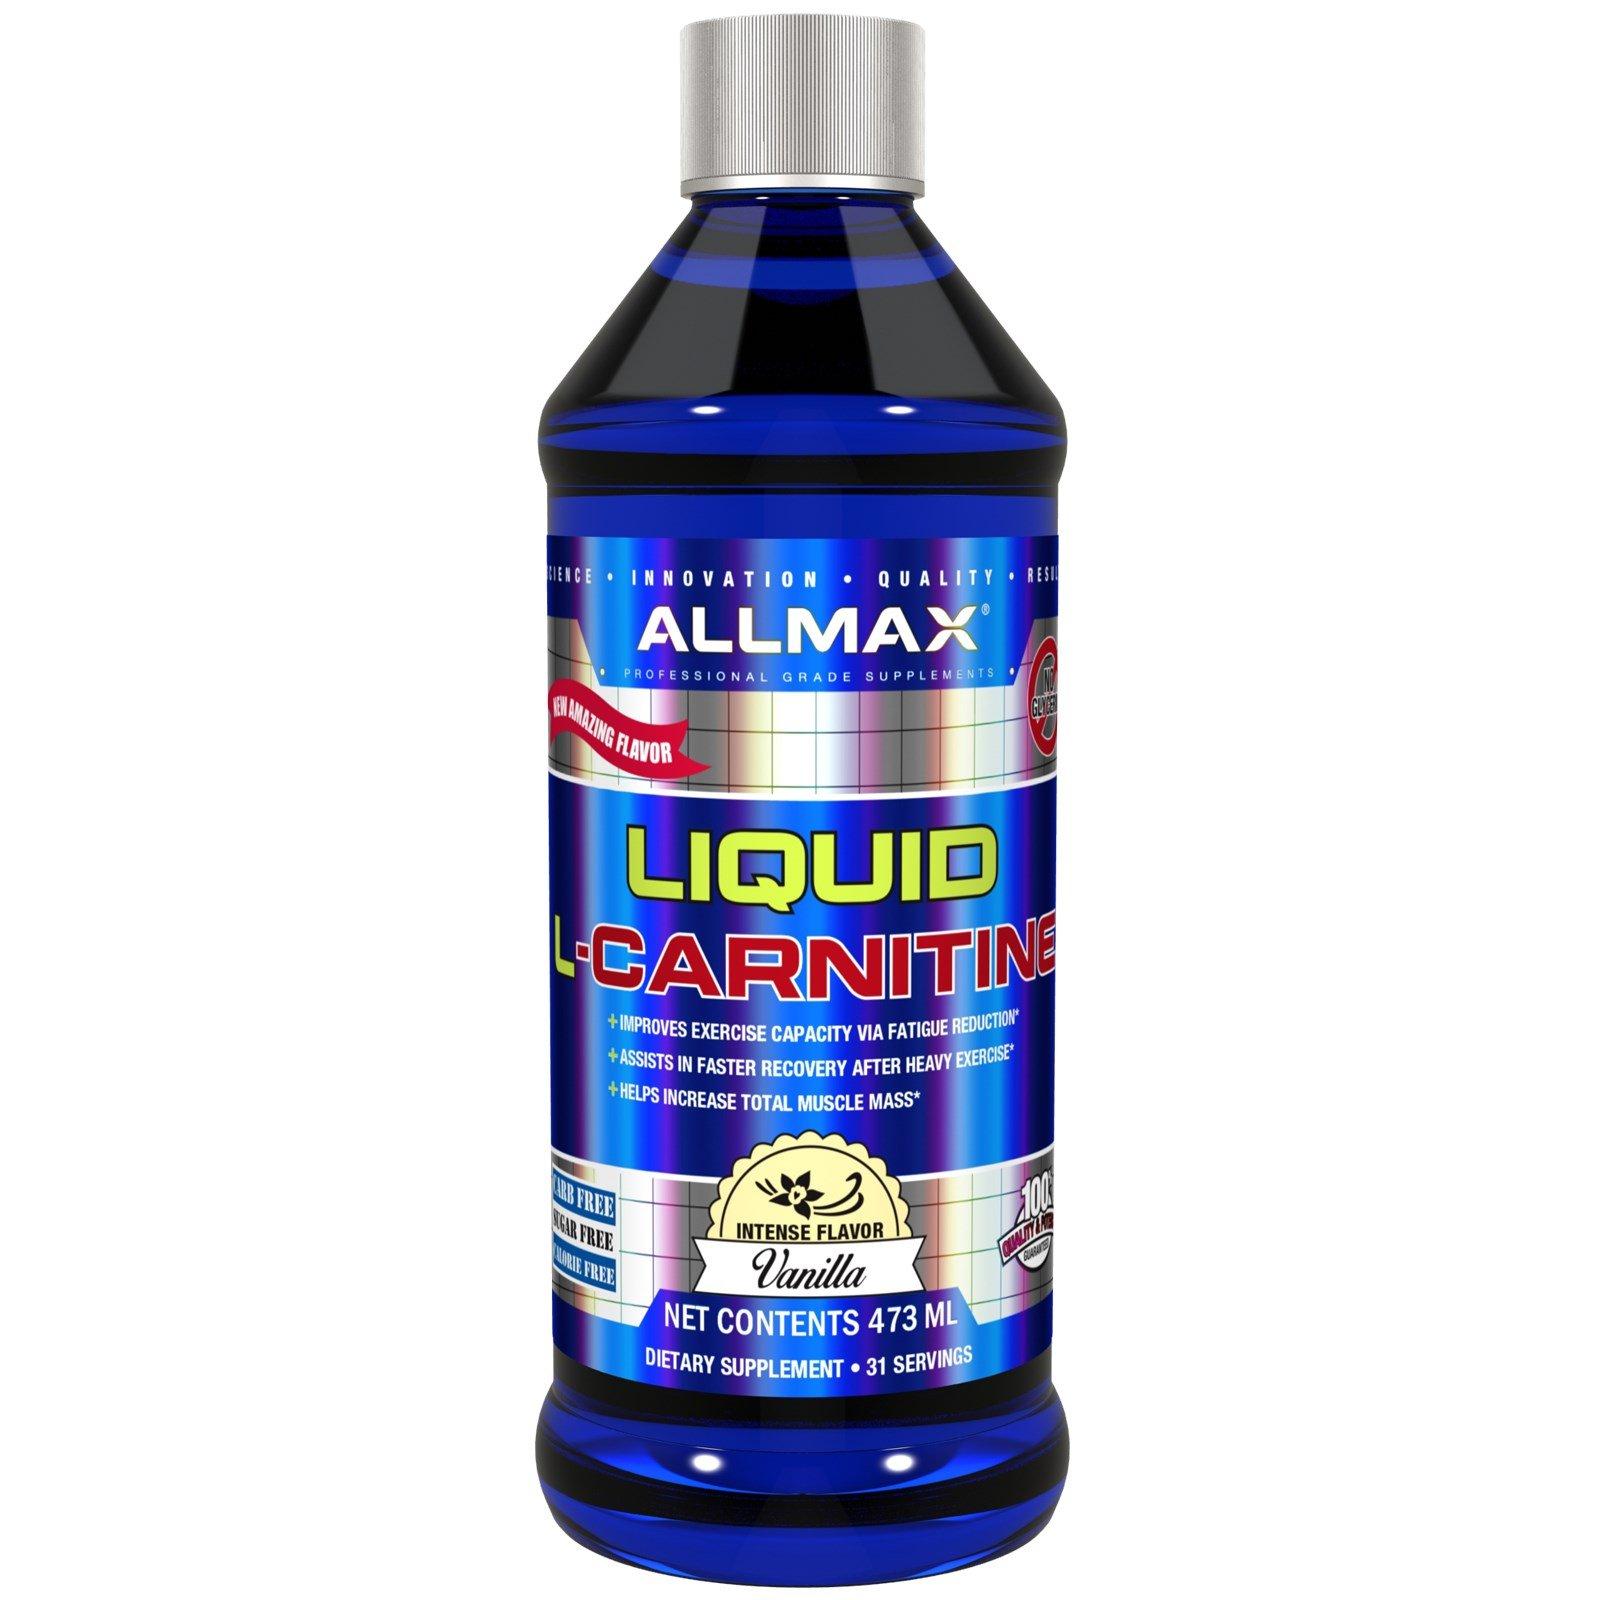 ALLMAX Nutrition L-Carnitine Liquid Vitamin B5 Vanilla Flavor 16 oz 473 ml